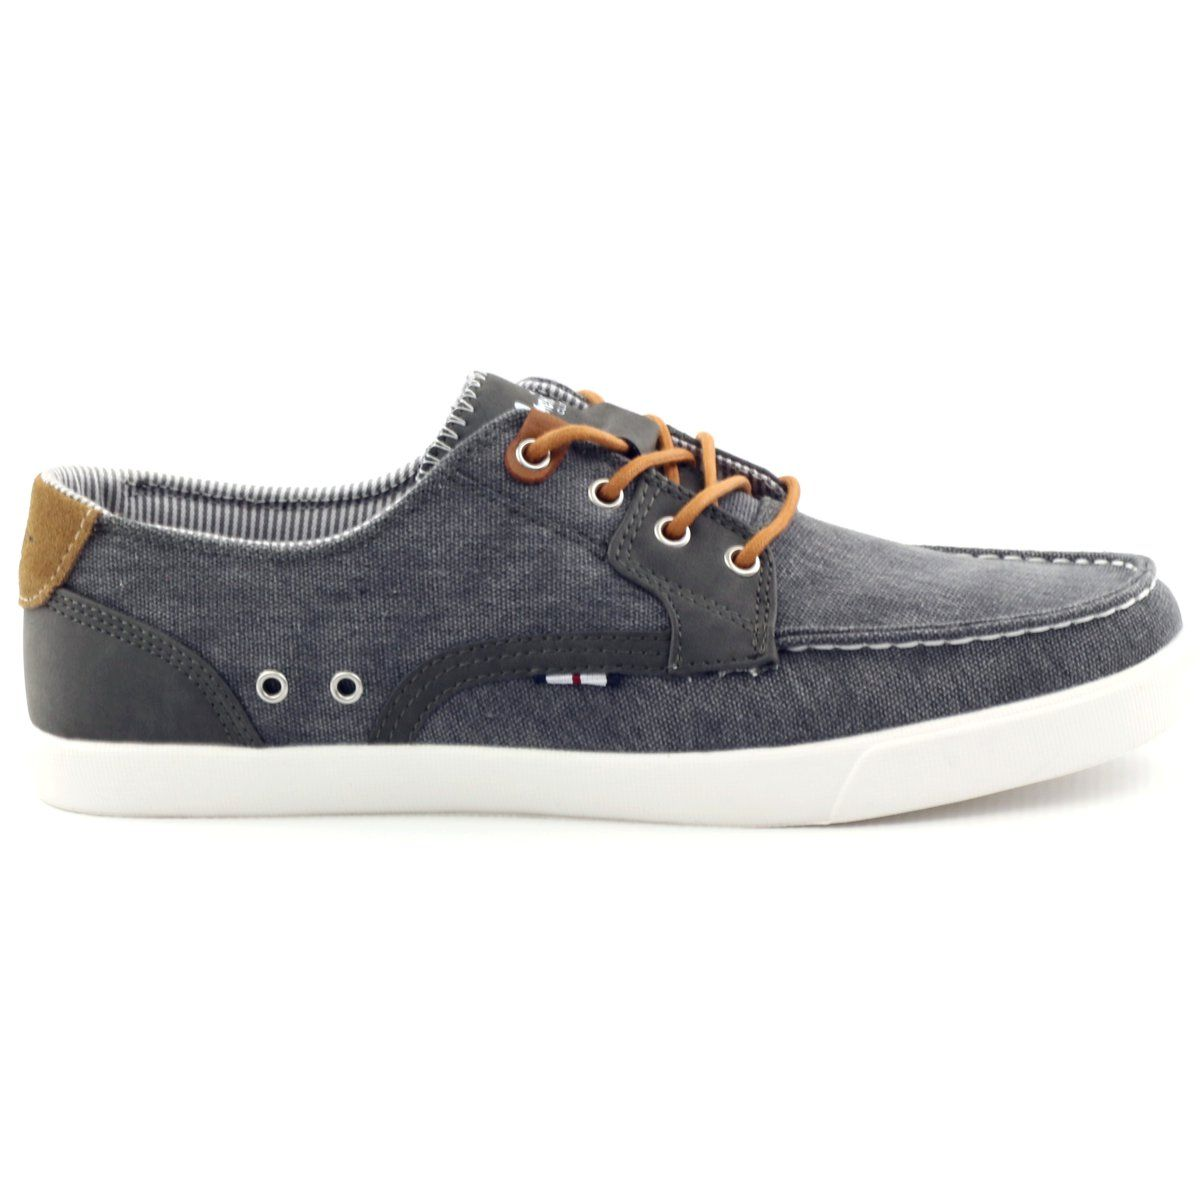 American Club Buty Meskie Mokasyny Tekstylne American 205081 Szare Men S Shoes Shoes Loafers